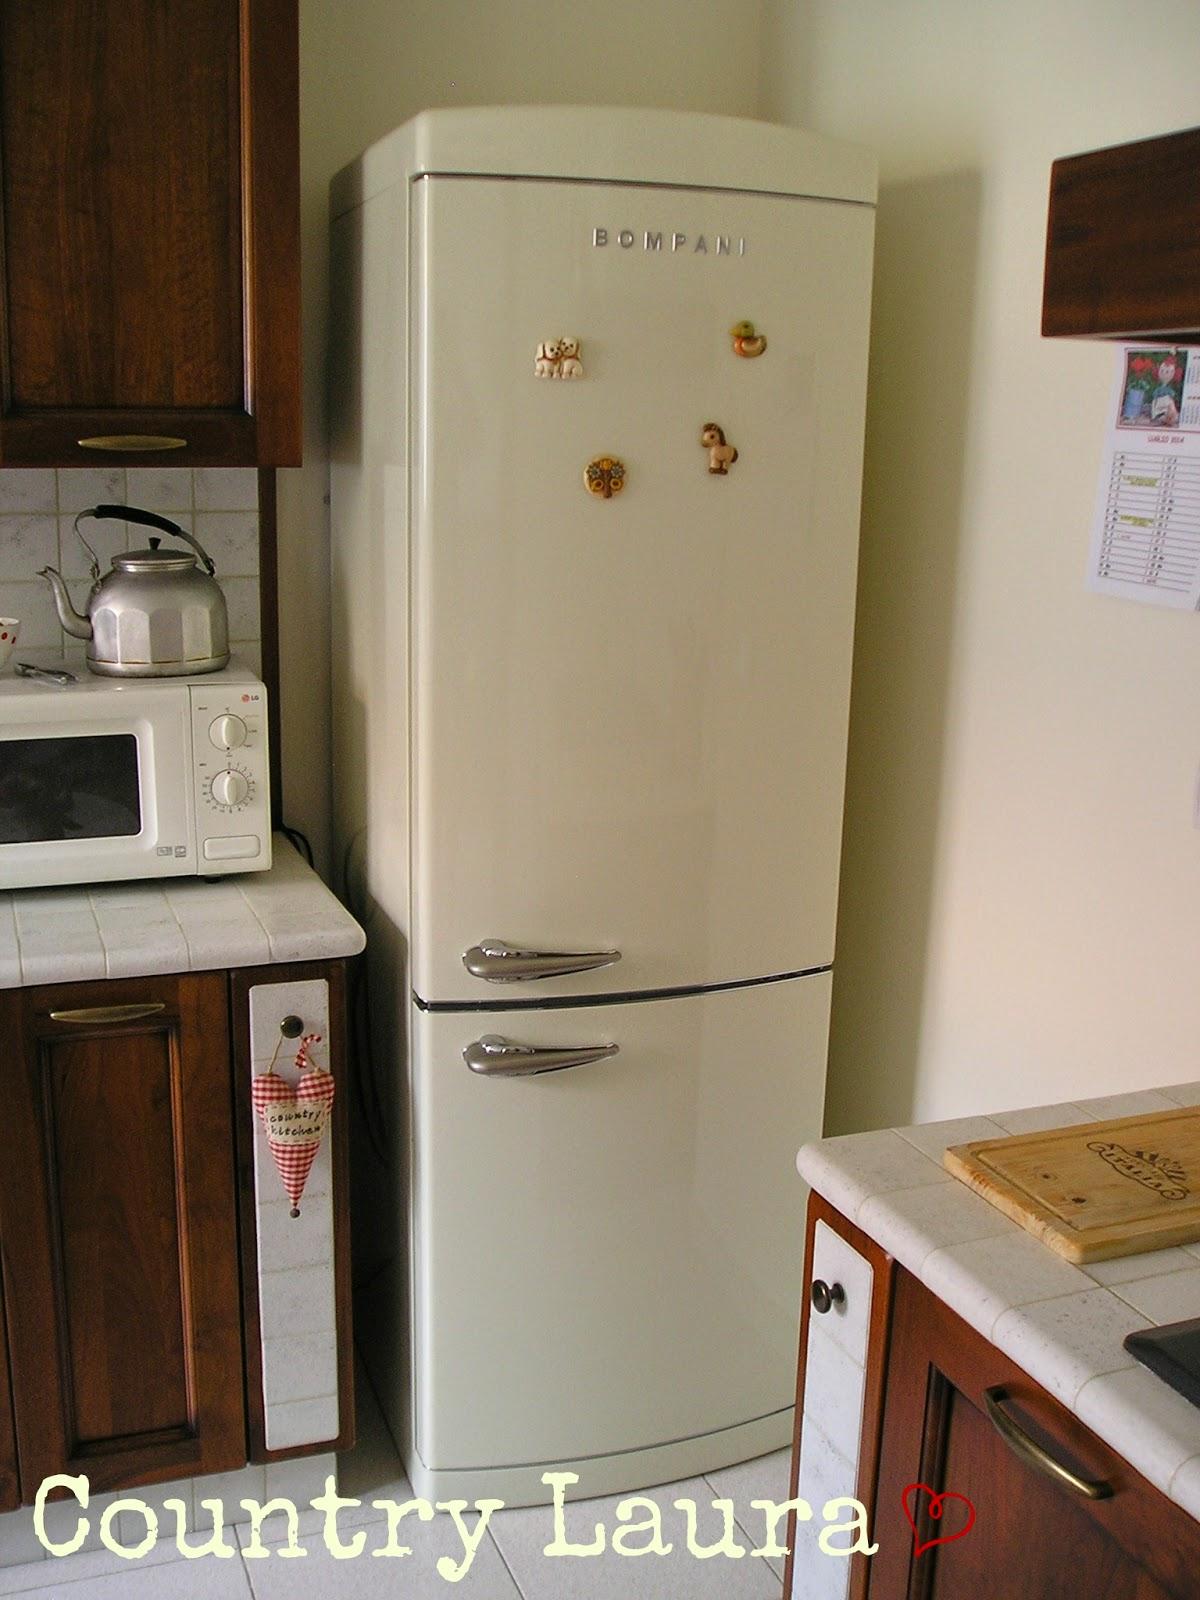 Forum parere su organizzazione cucina - Cucine con frigo smeg ...